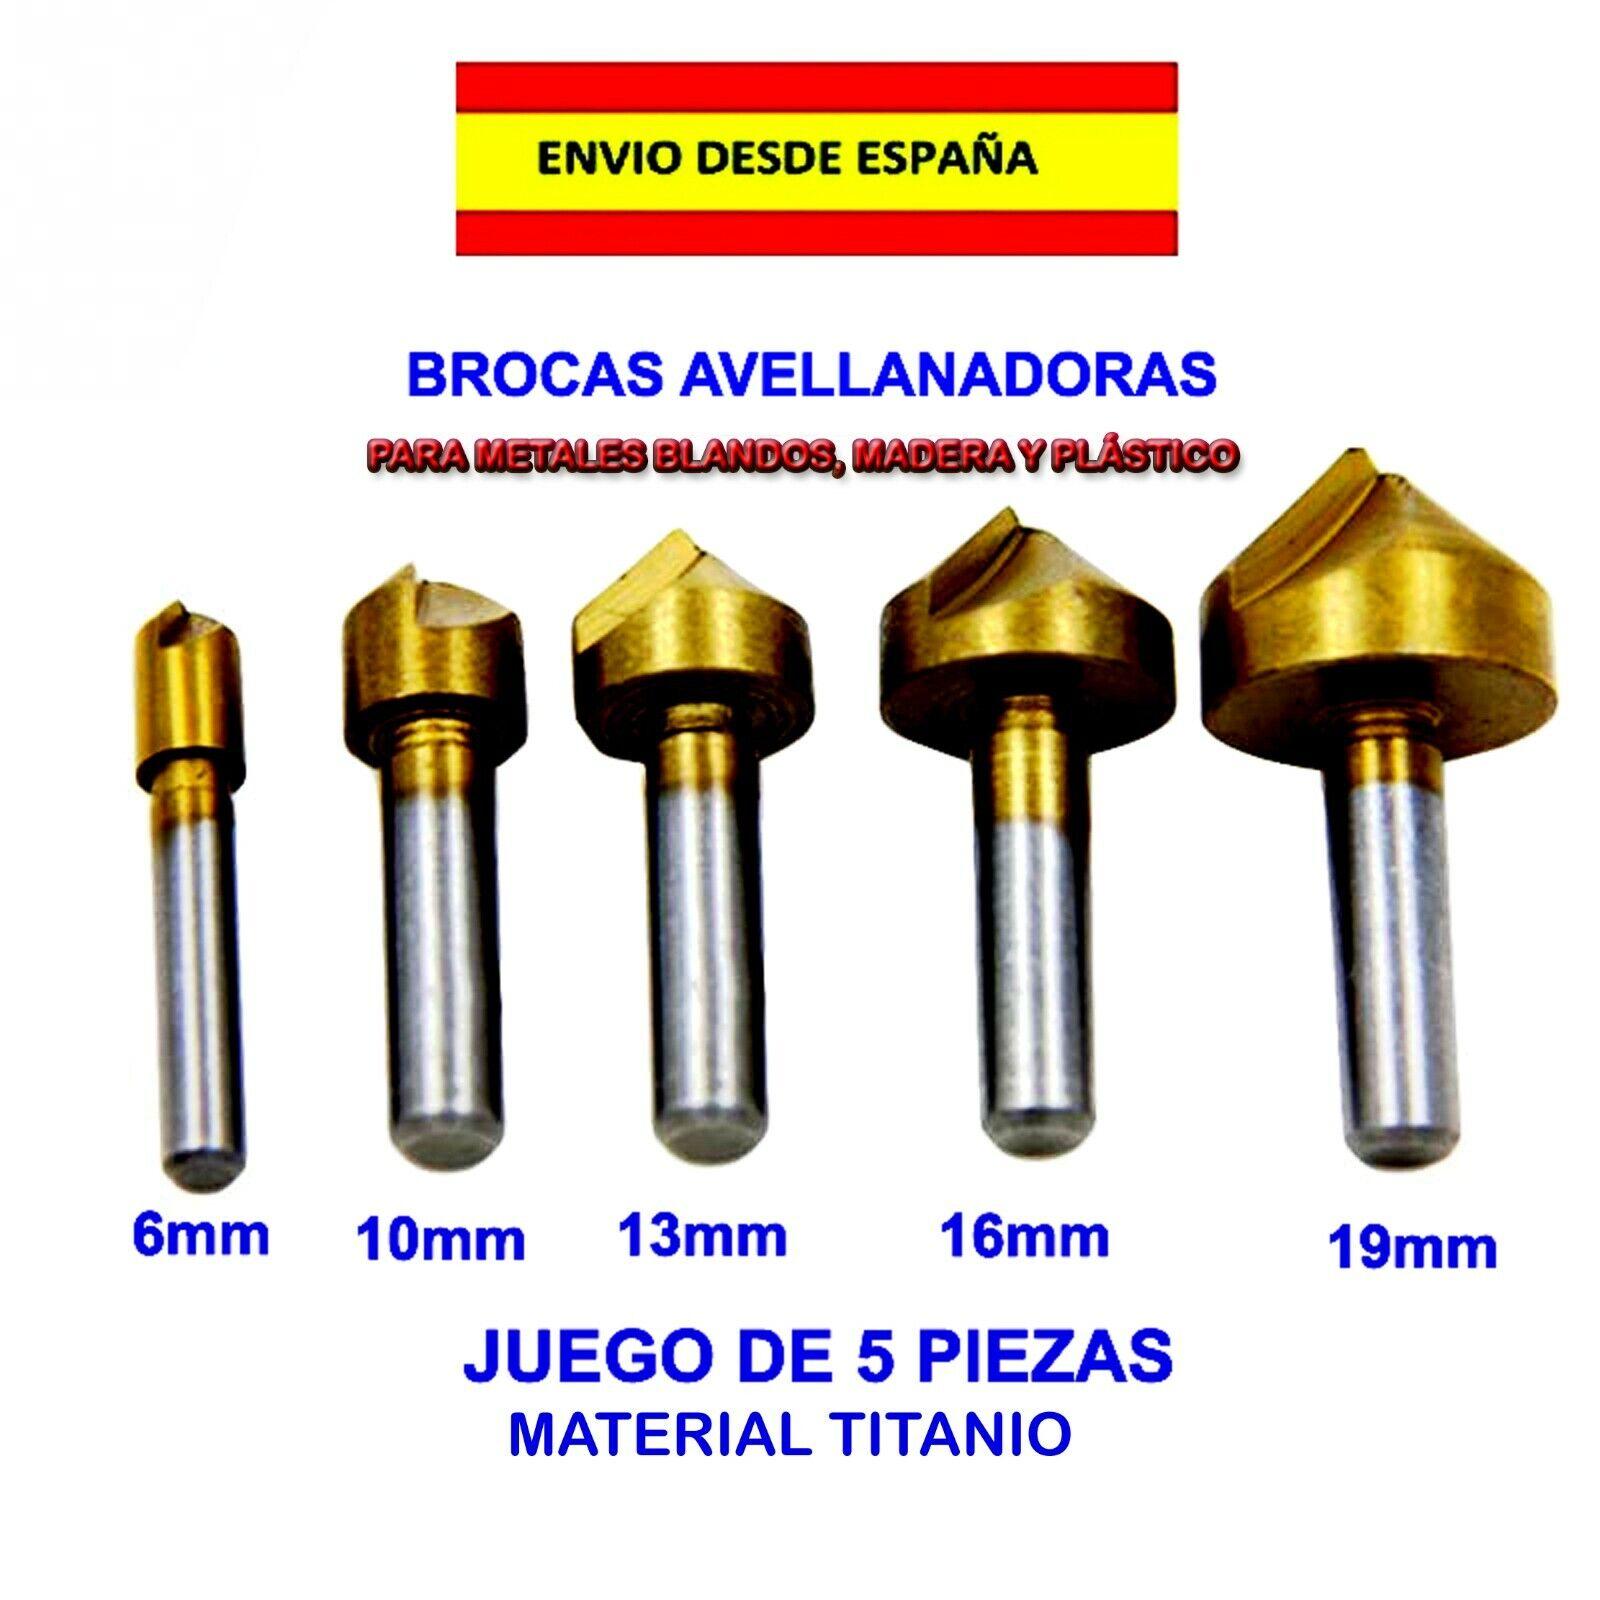 s l1600 - BROCAS AVELLANADORAS FLAUTA 5 PZ CARPINTERIA BICROLAGE MANUALIDADES INSTALACIÓN